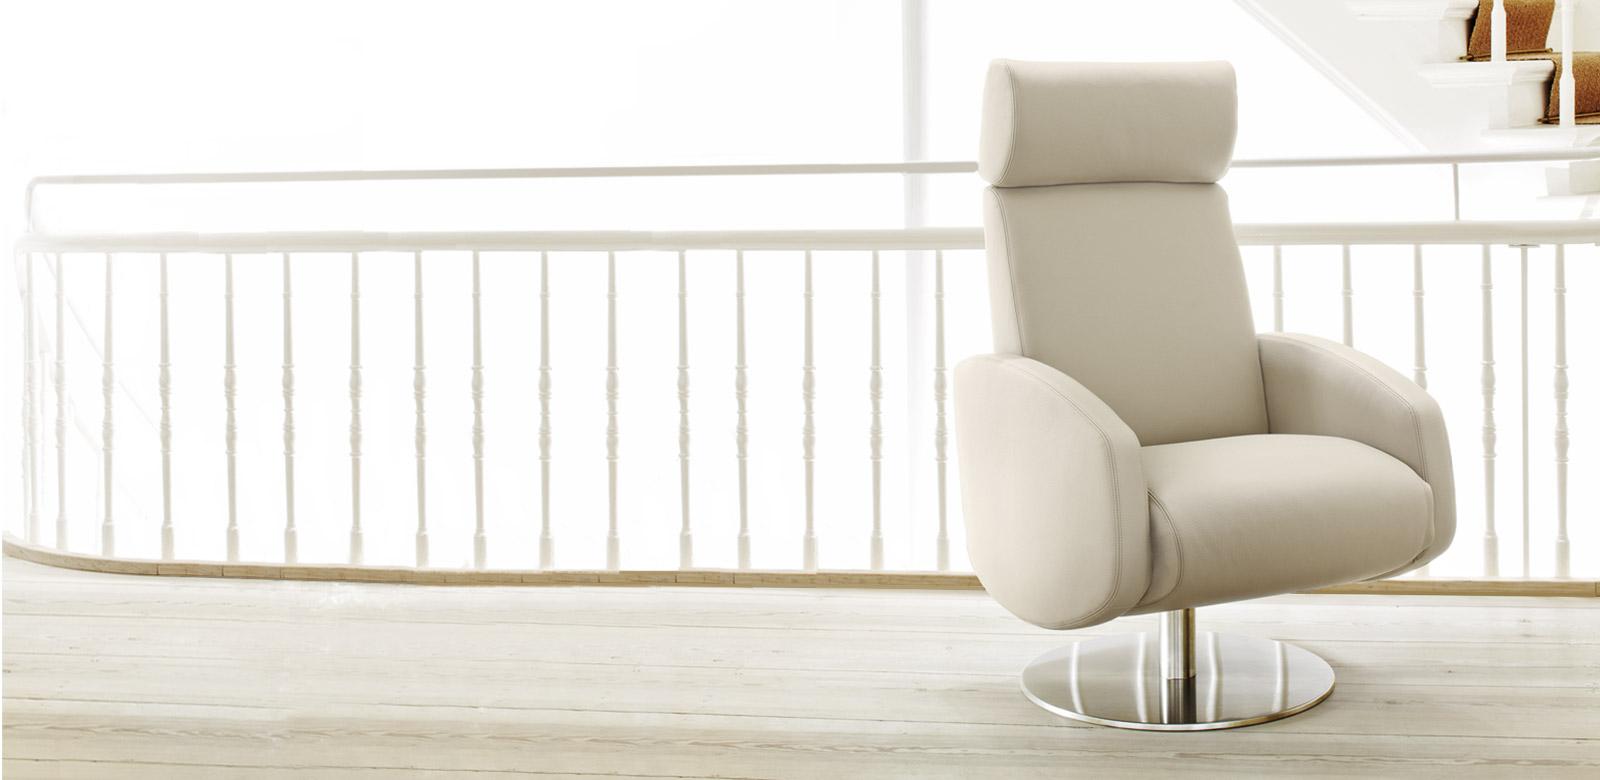 Edle Stühle erpo re 200 ergonomische sessel edle stühle